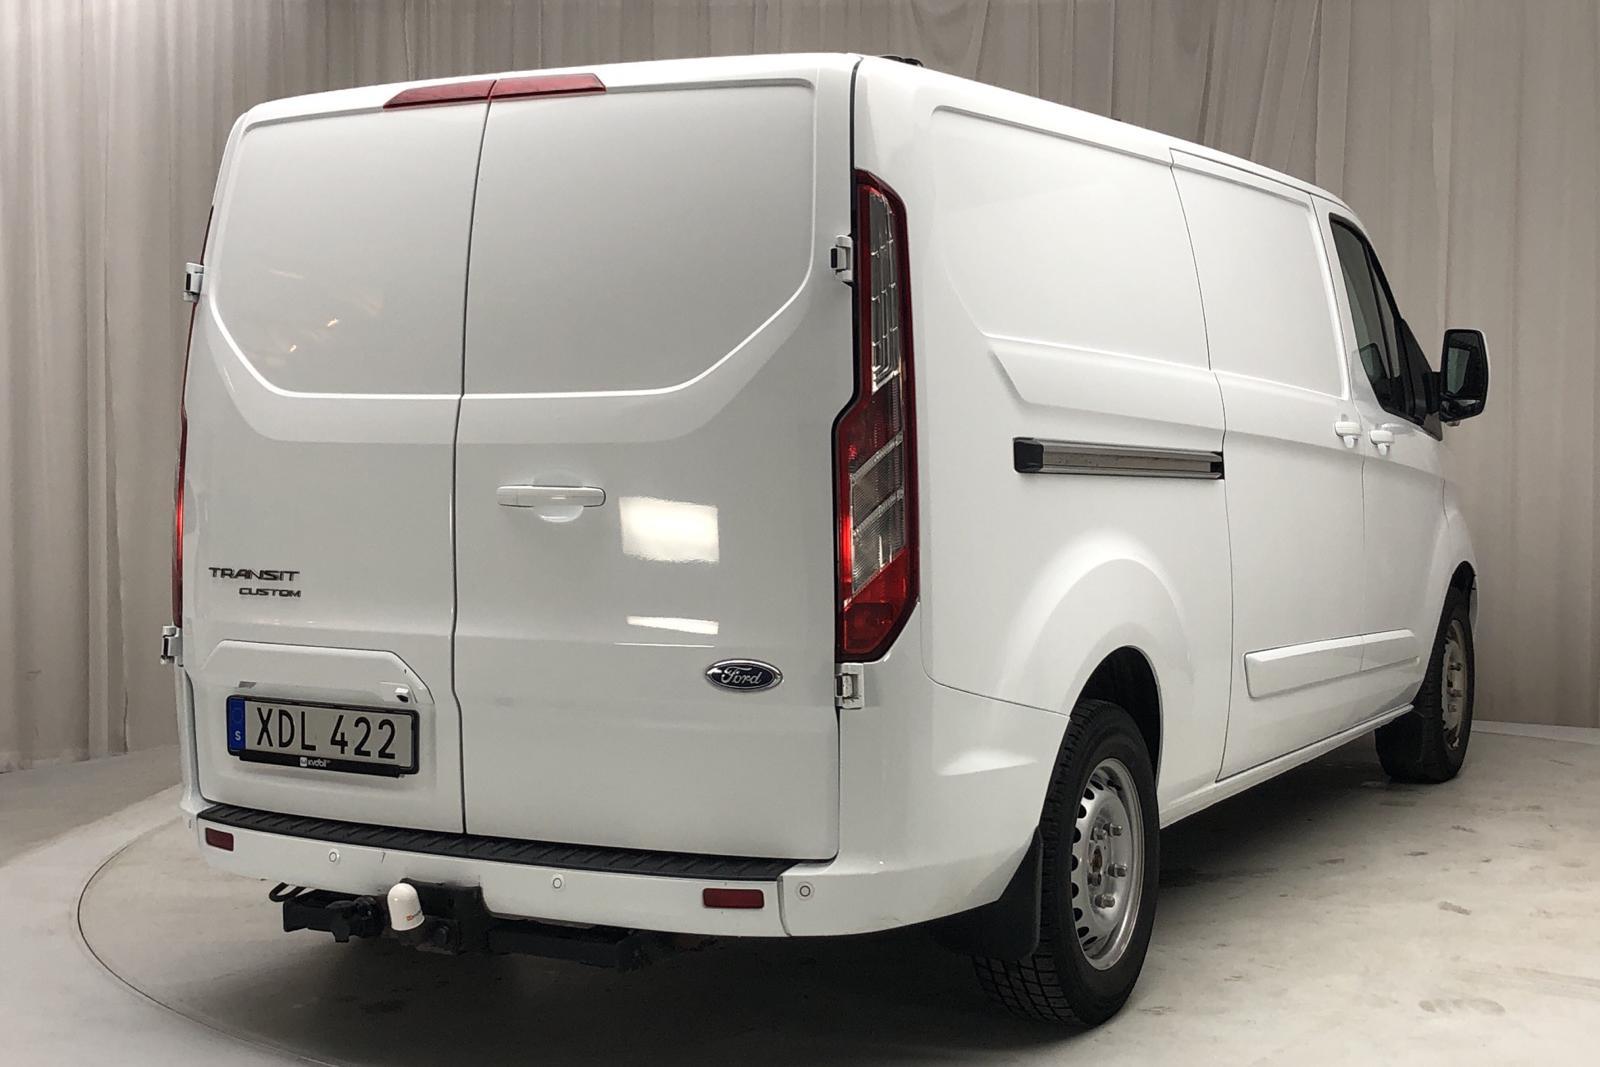 Ford Transit Custom 330 (170hk) - 0 km - Automatic - white - 2018